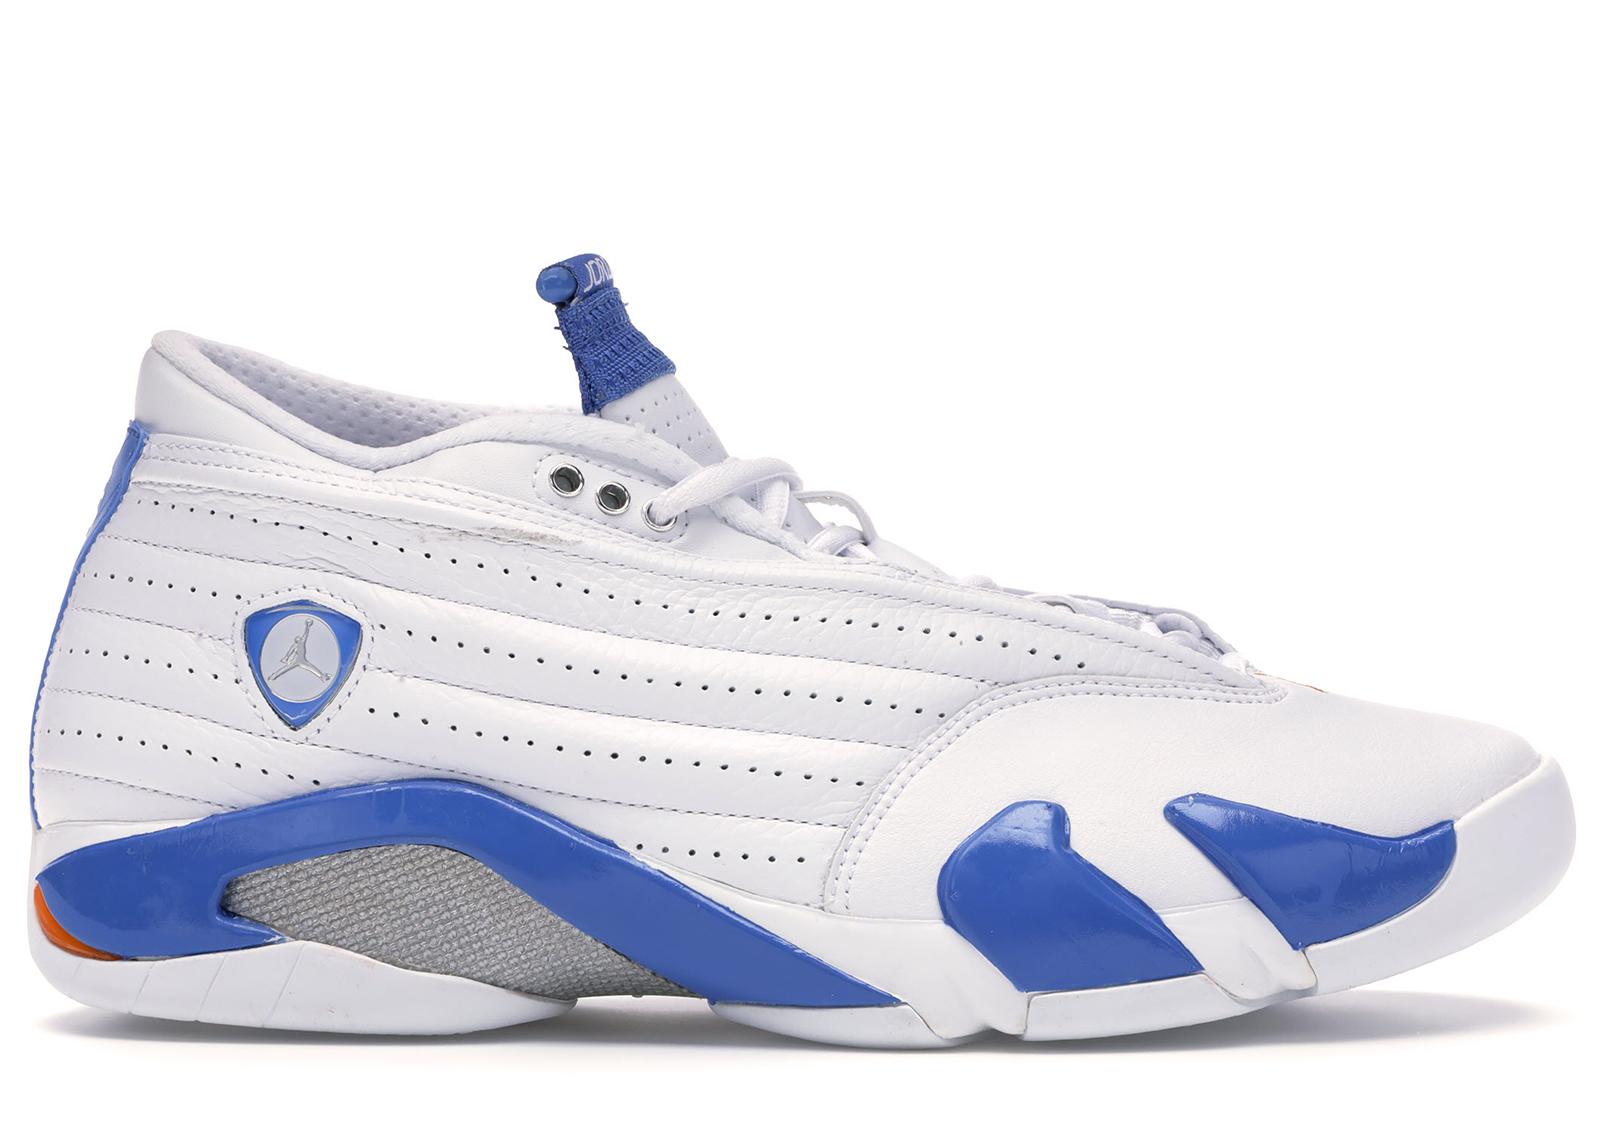 Jordan 14 Retro Low Pacific Blue